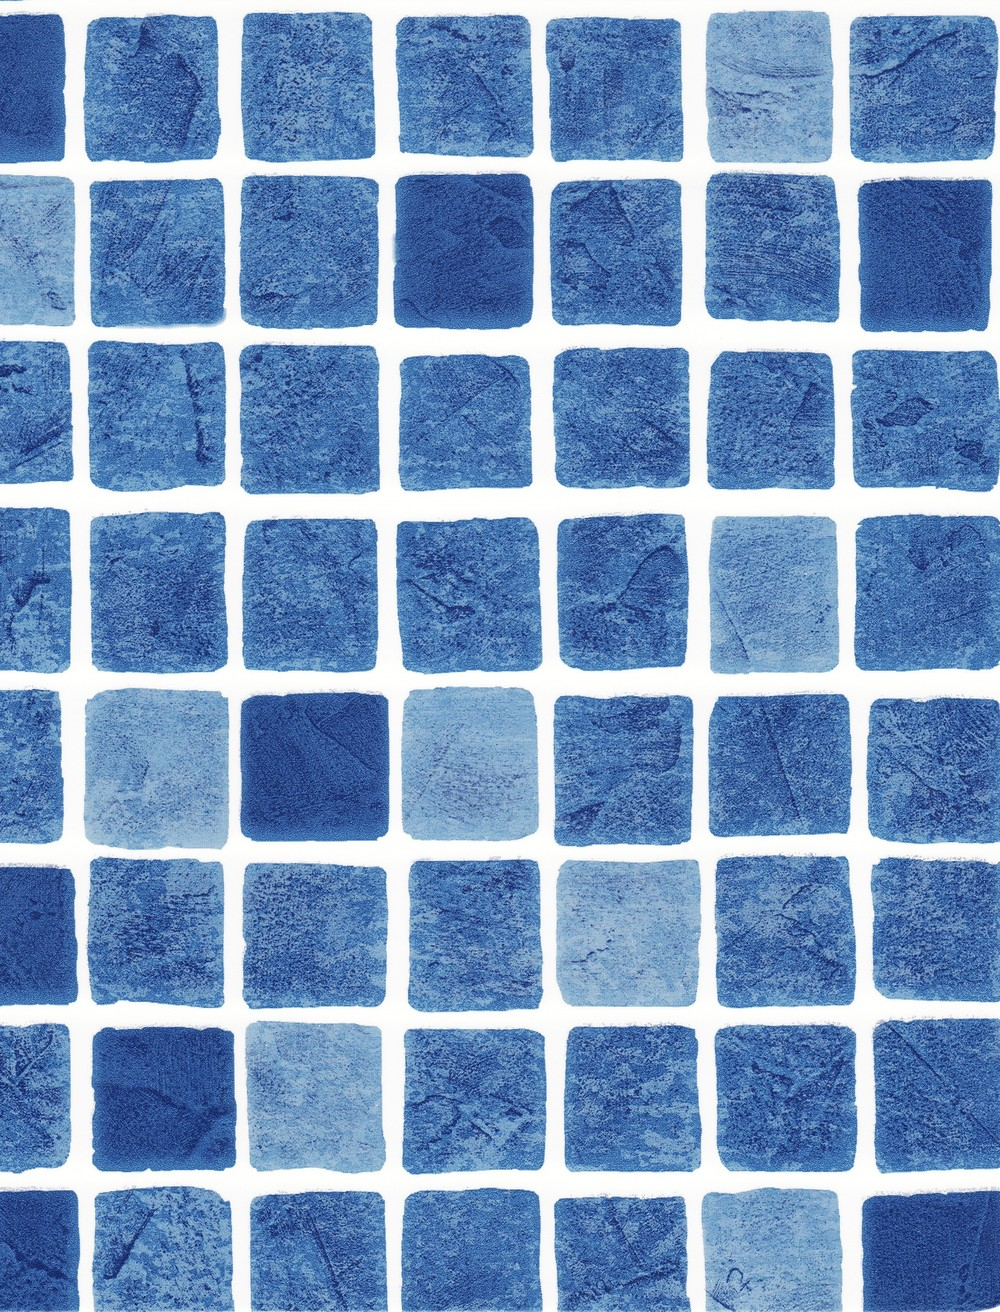 Persia Blue Mosaic.jpg